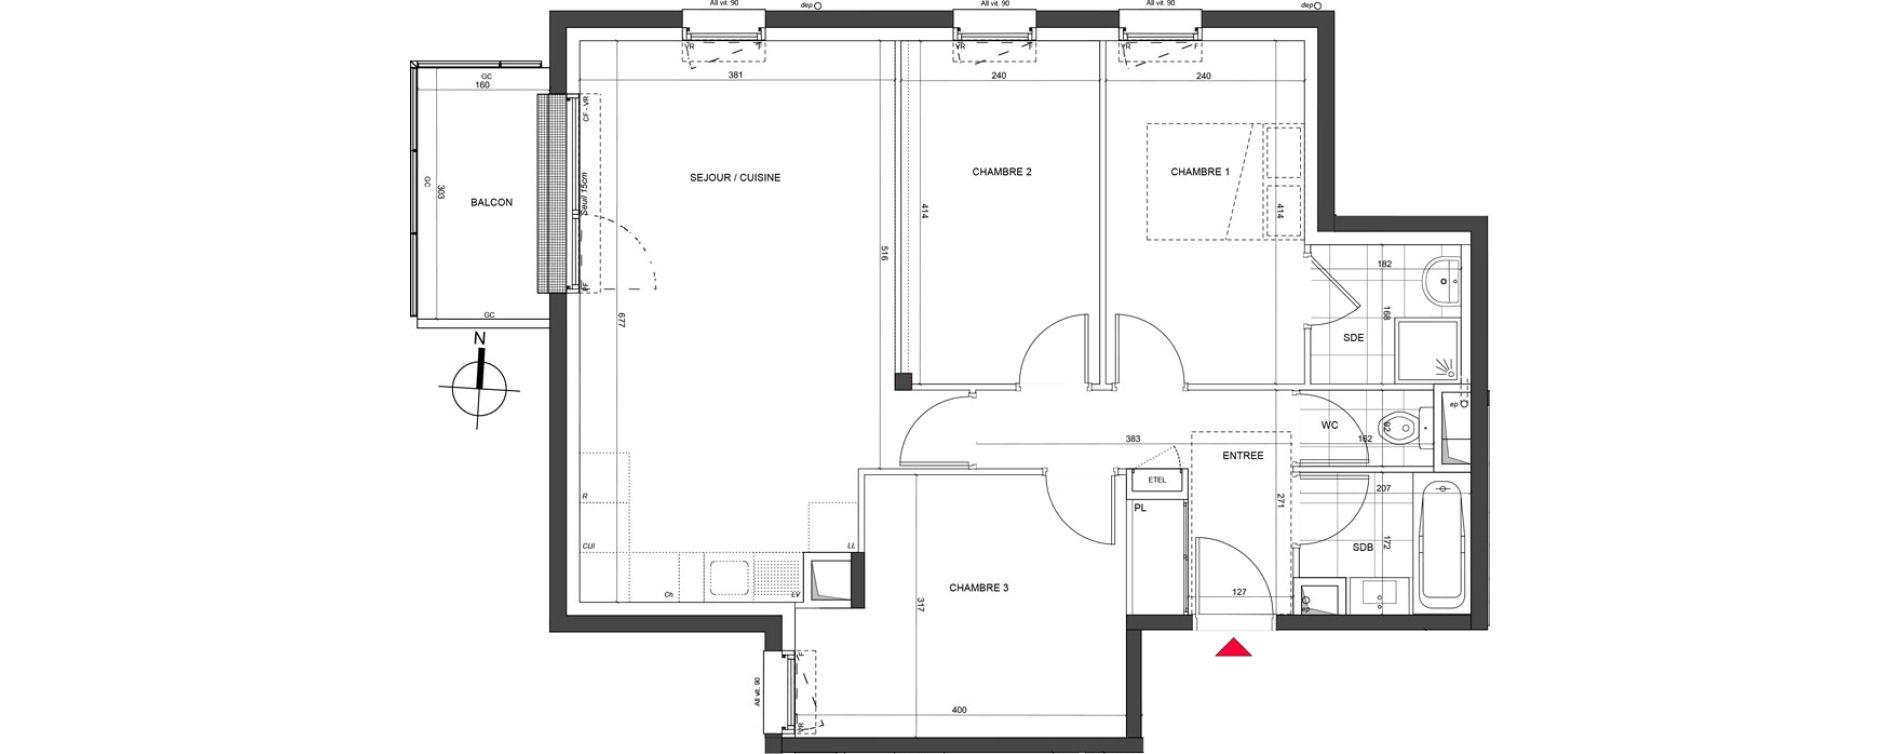 Appartement T4 de 71,36 m2 à Nancy Charles iii